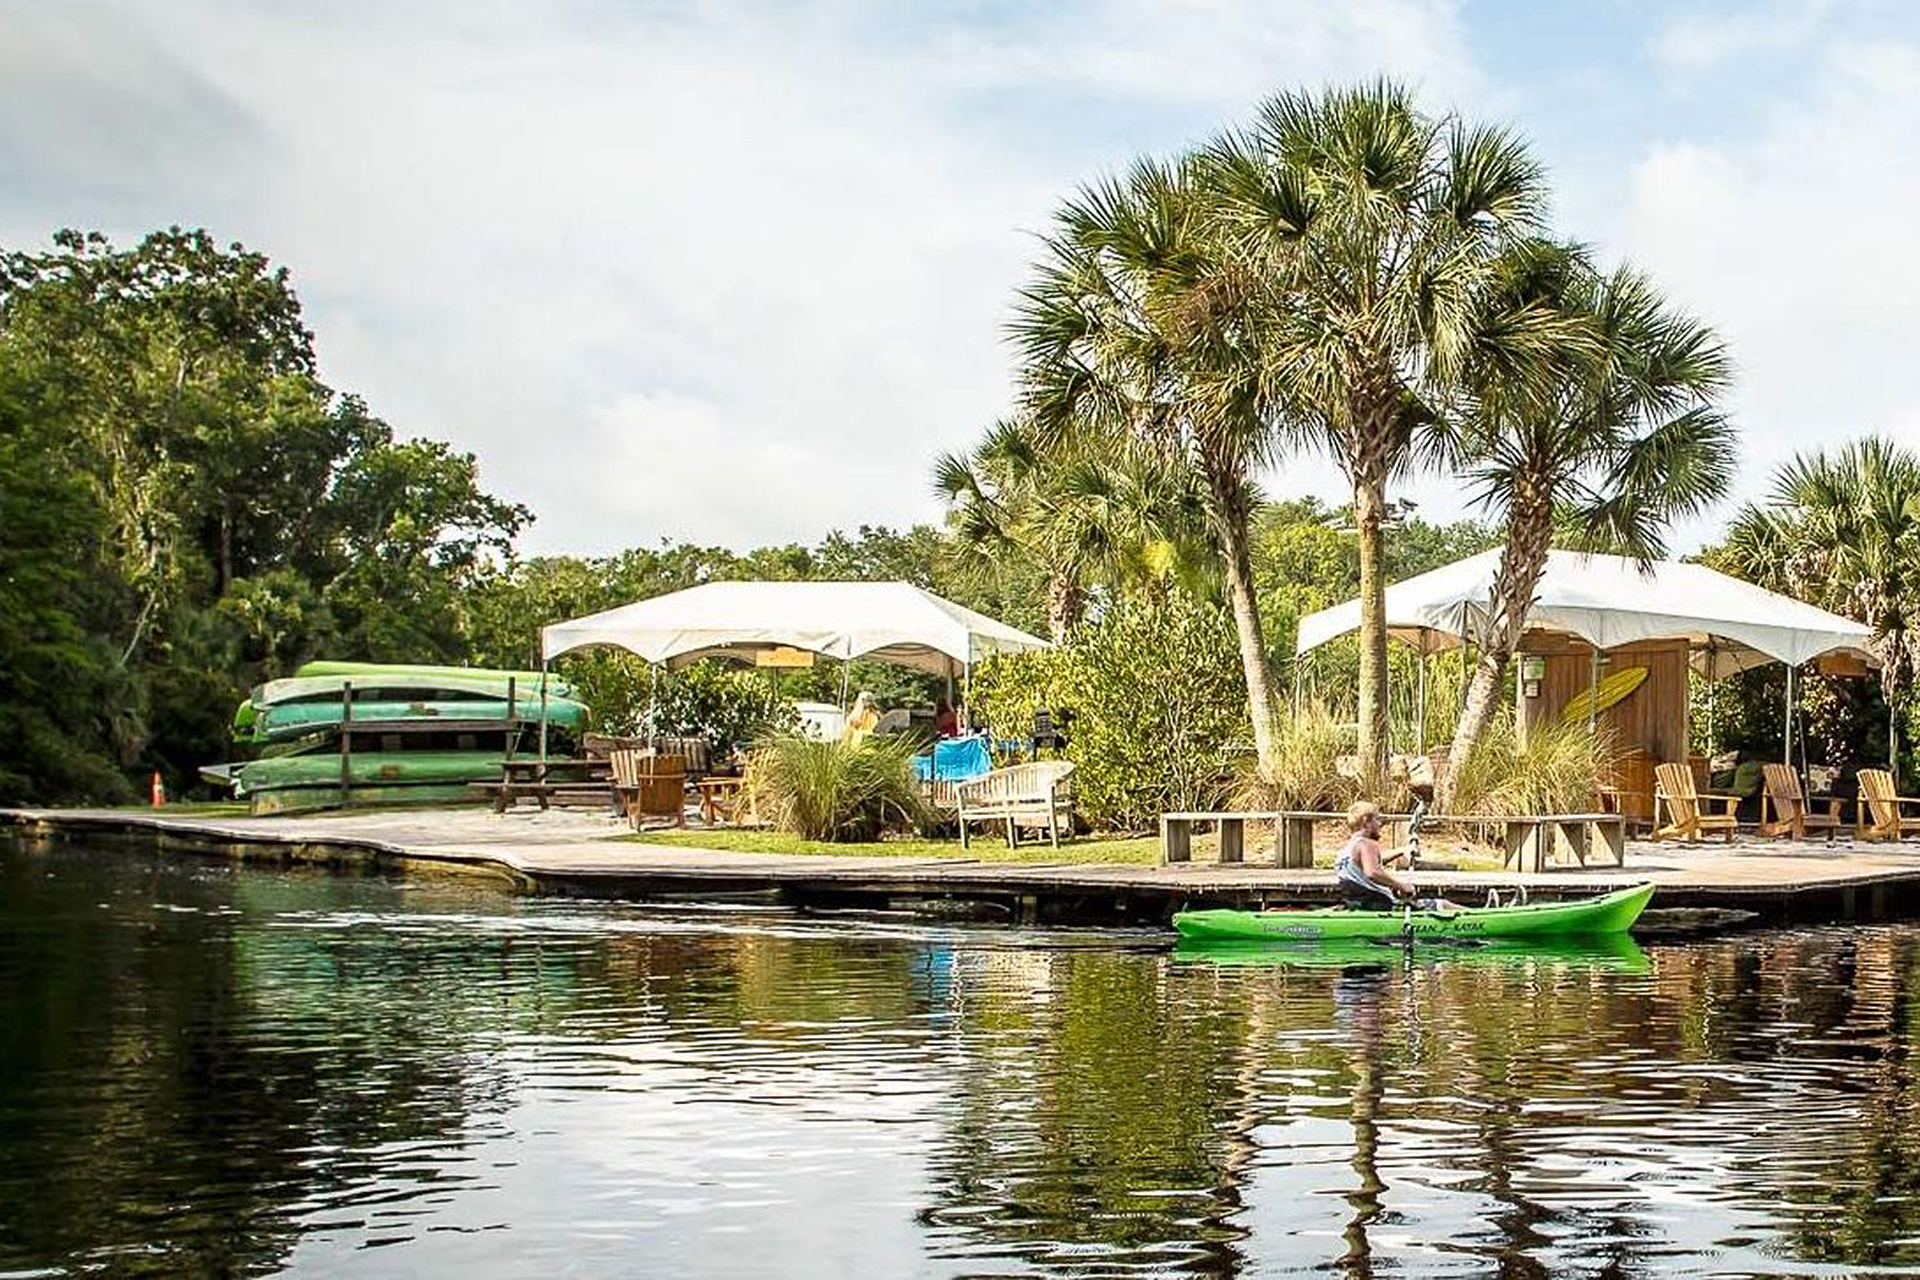 Seminole County, Florida; Courtesy of Orlando North Seminole County Tourism